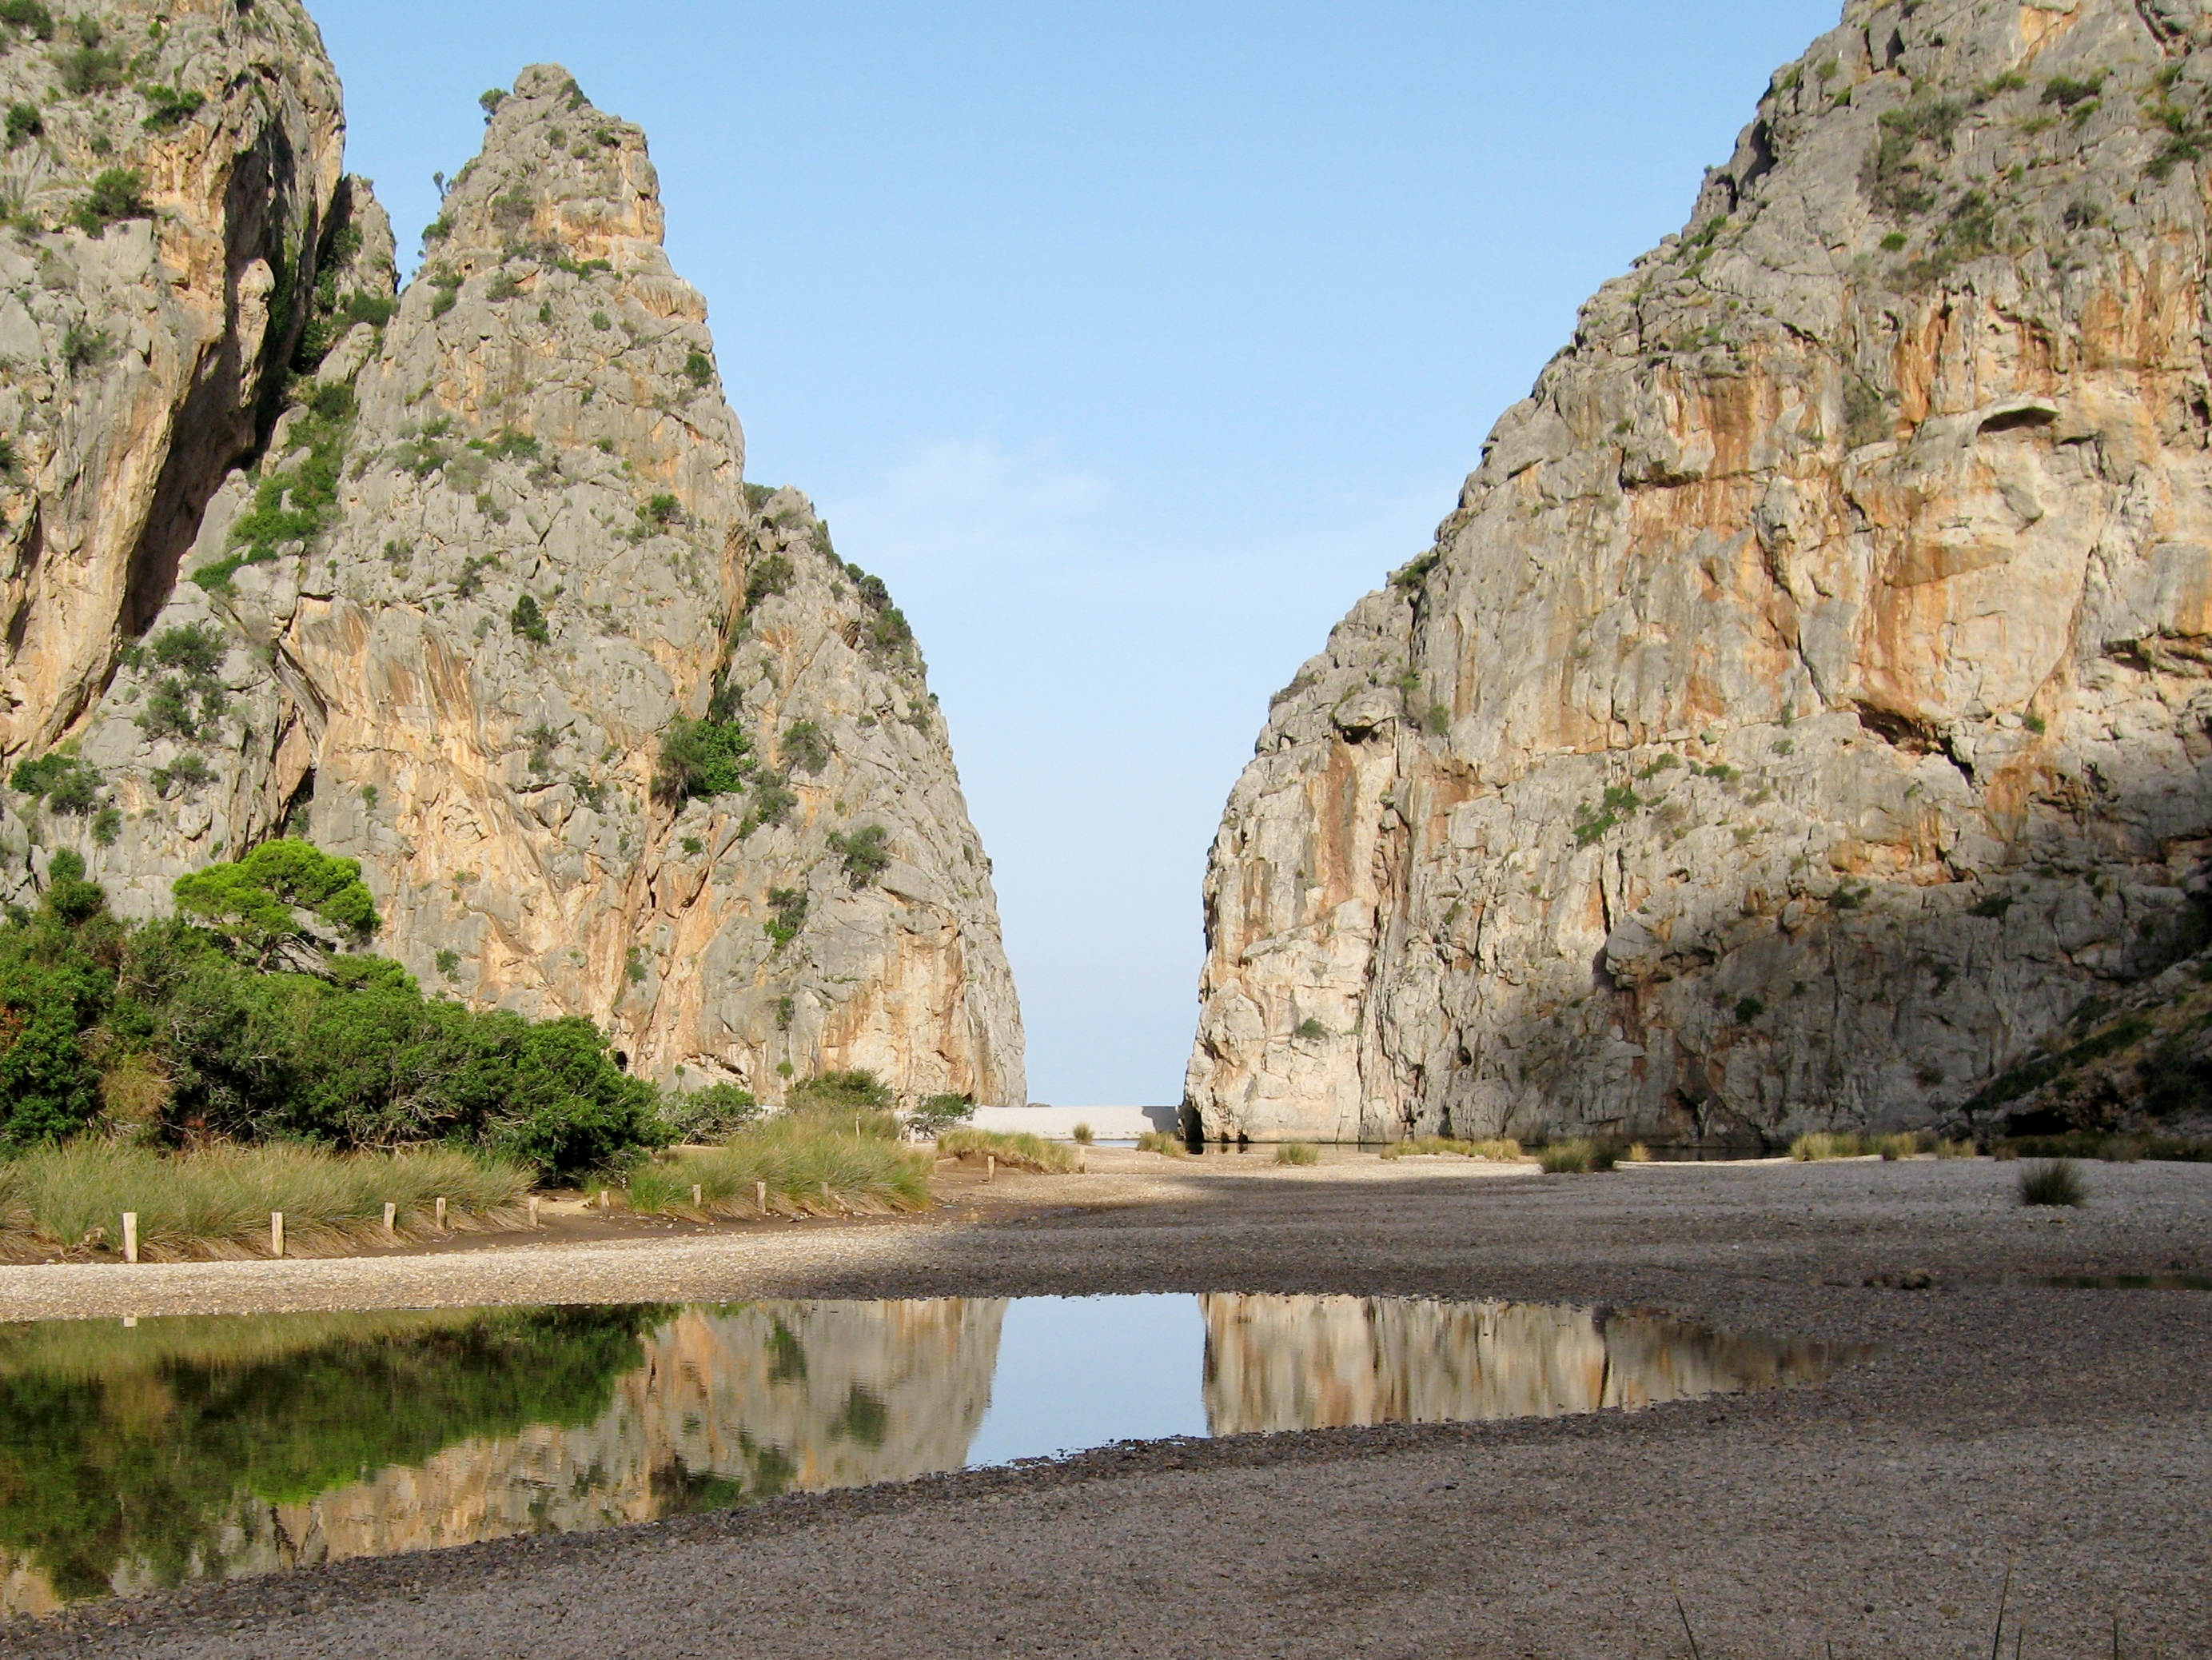 Mündung des Torrent de Pareis